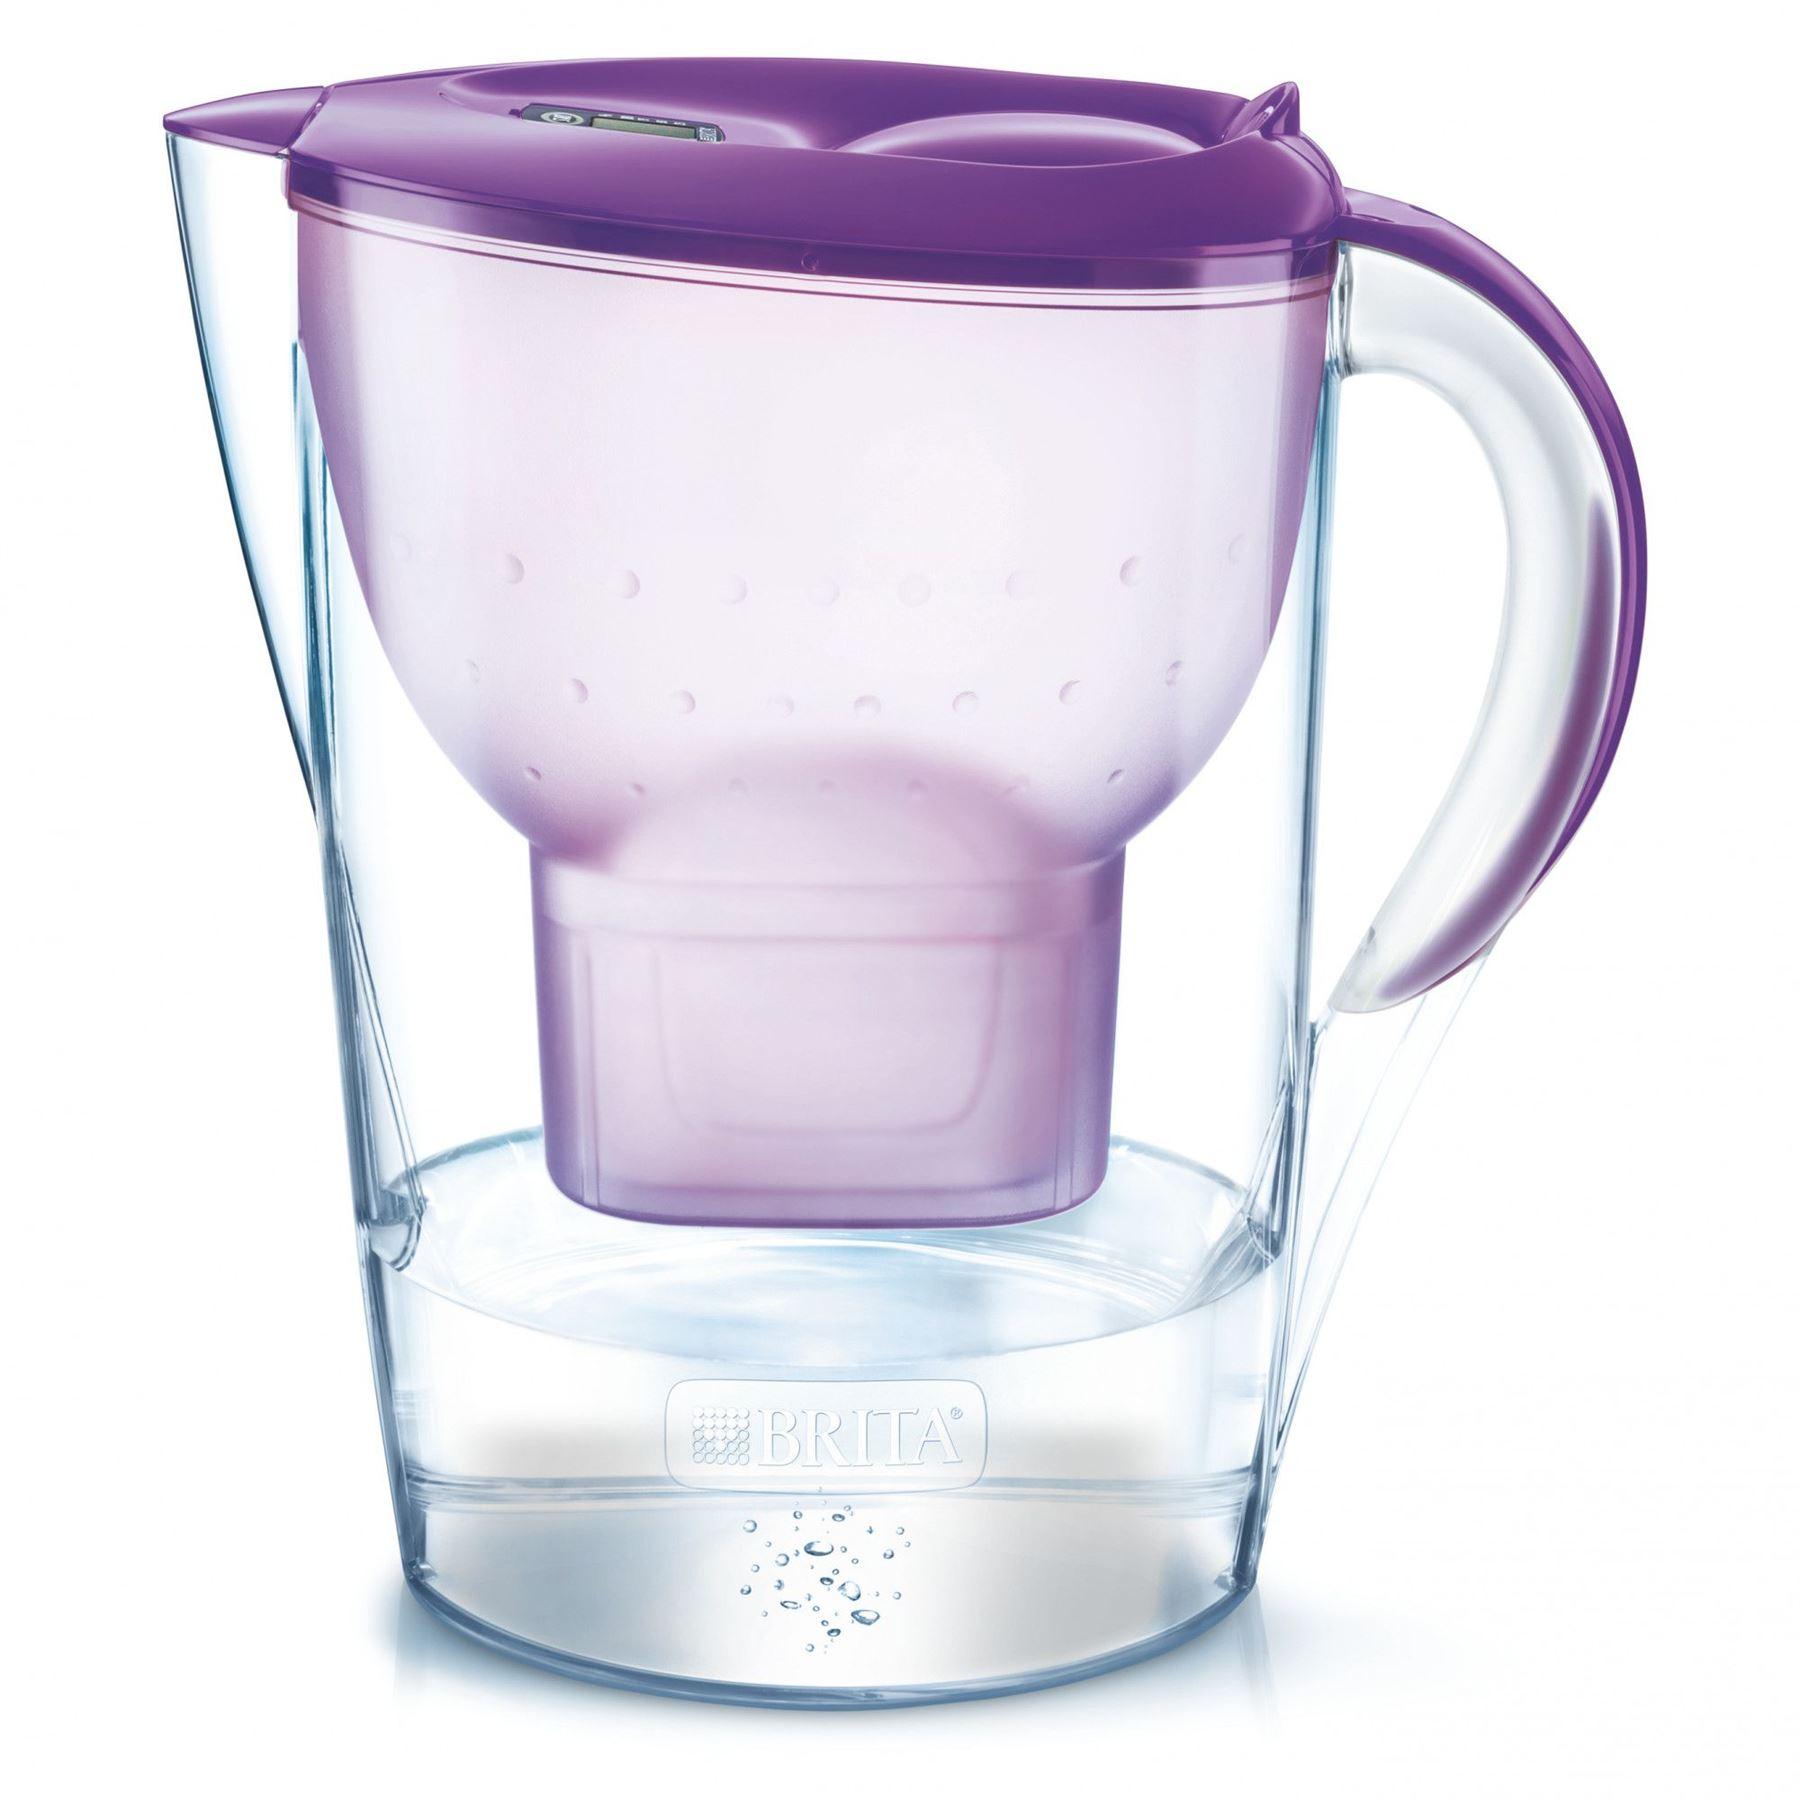 BRITA Marella Cool MAXTRA+ 2.4L Water Filter Fridge Jug + Cartridge - 8 Colours ebay £12.95 @ ozaroo-uk ebay